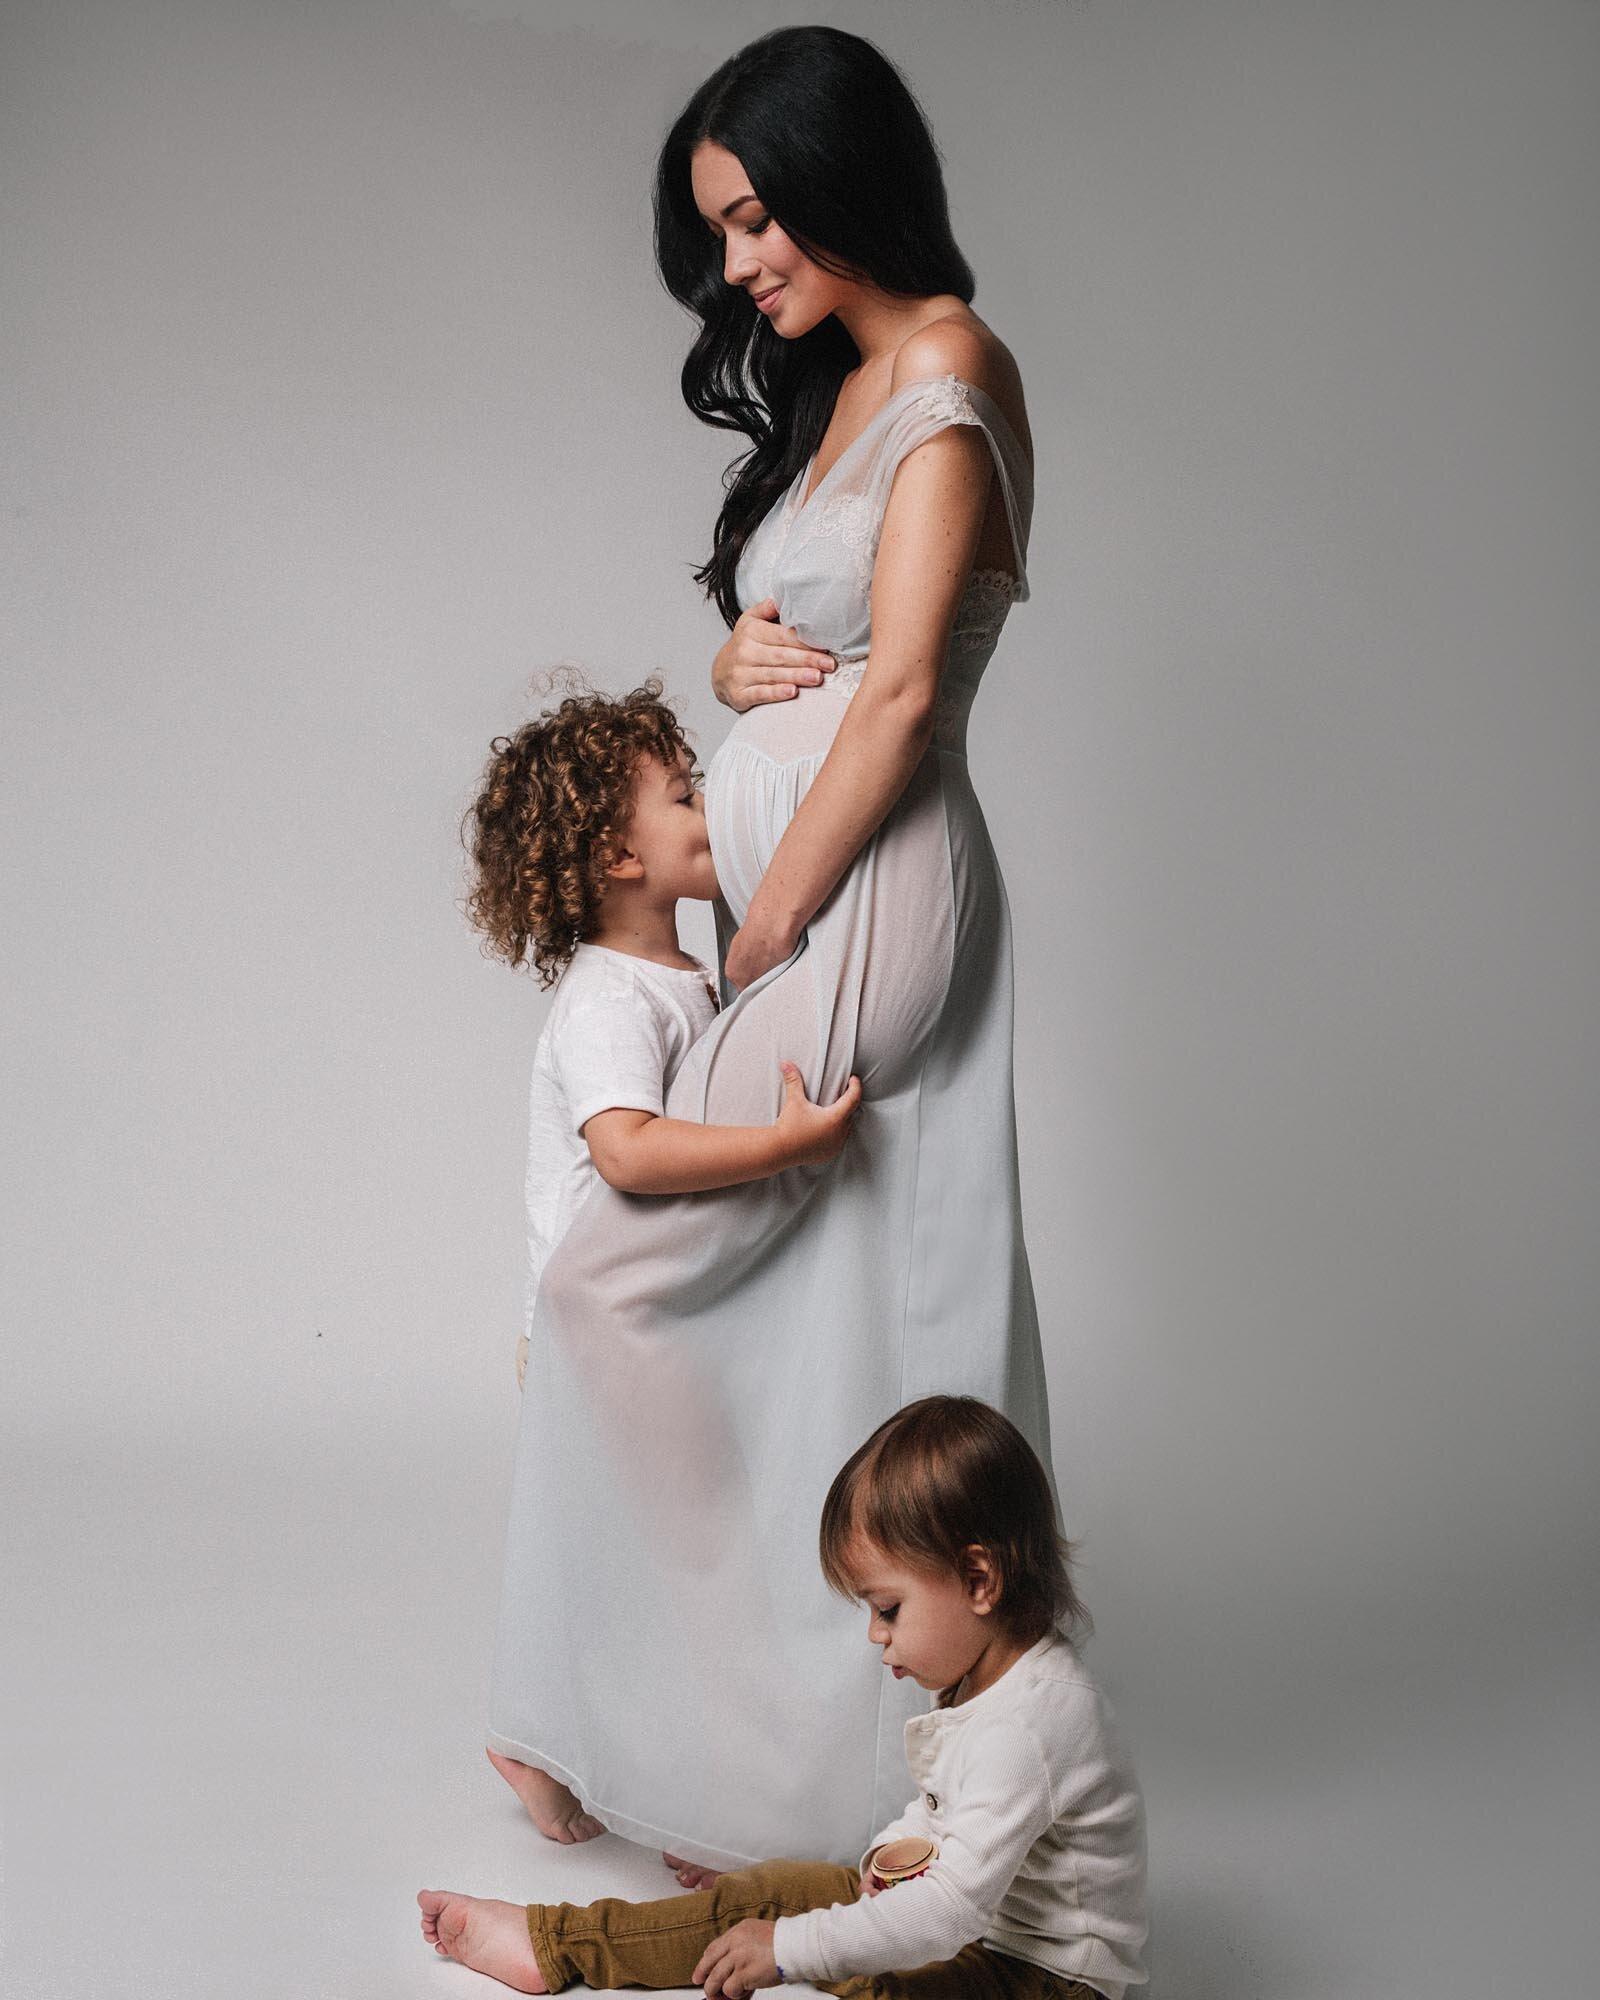 nyc-photographers-family-photographer-10012.jpg